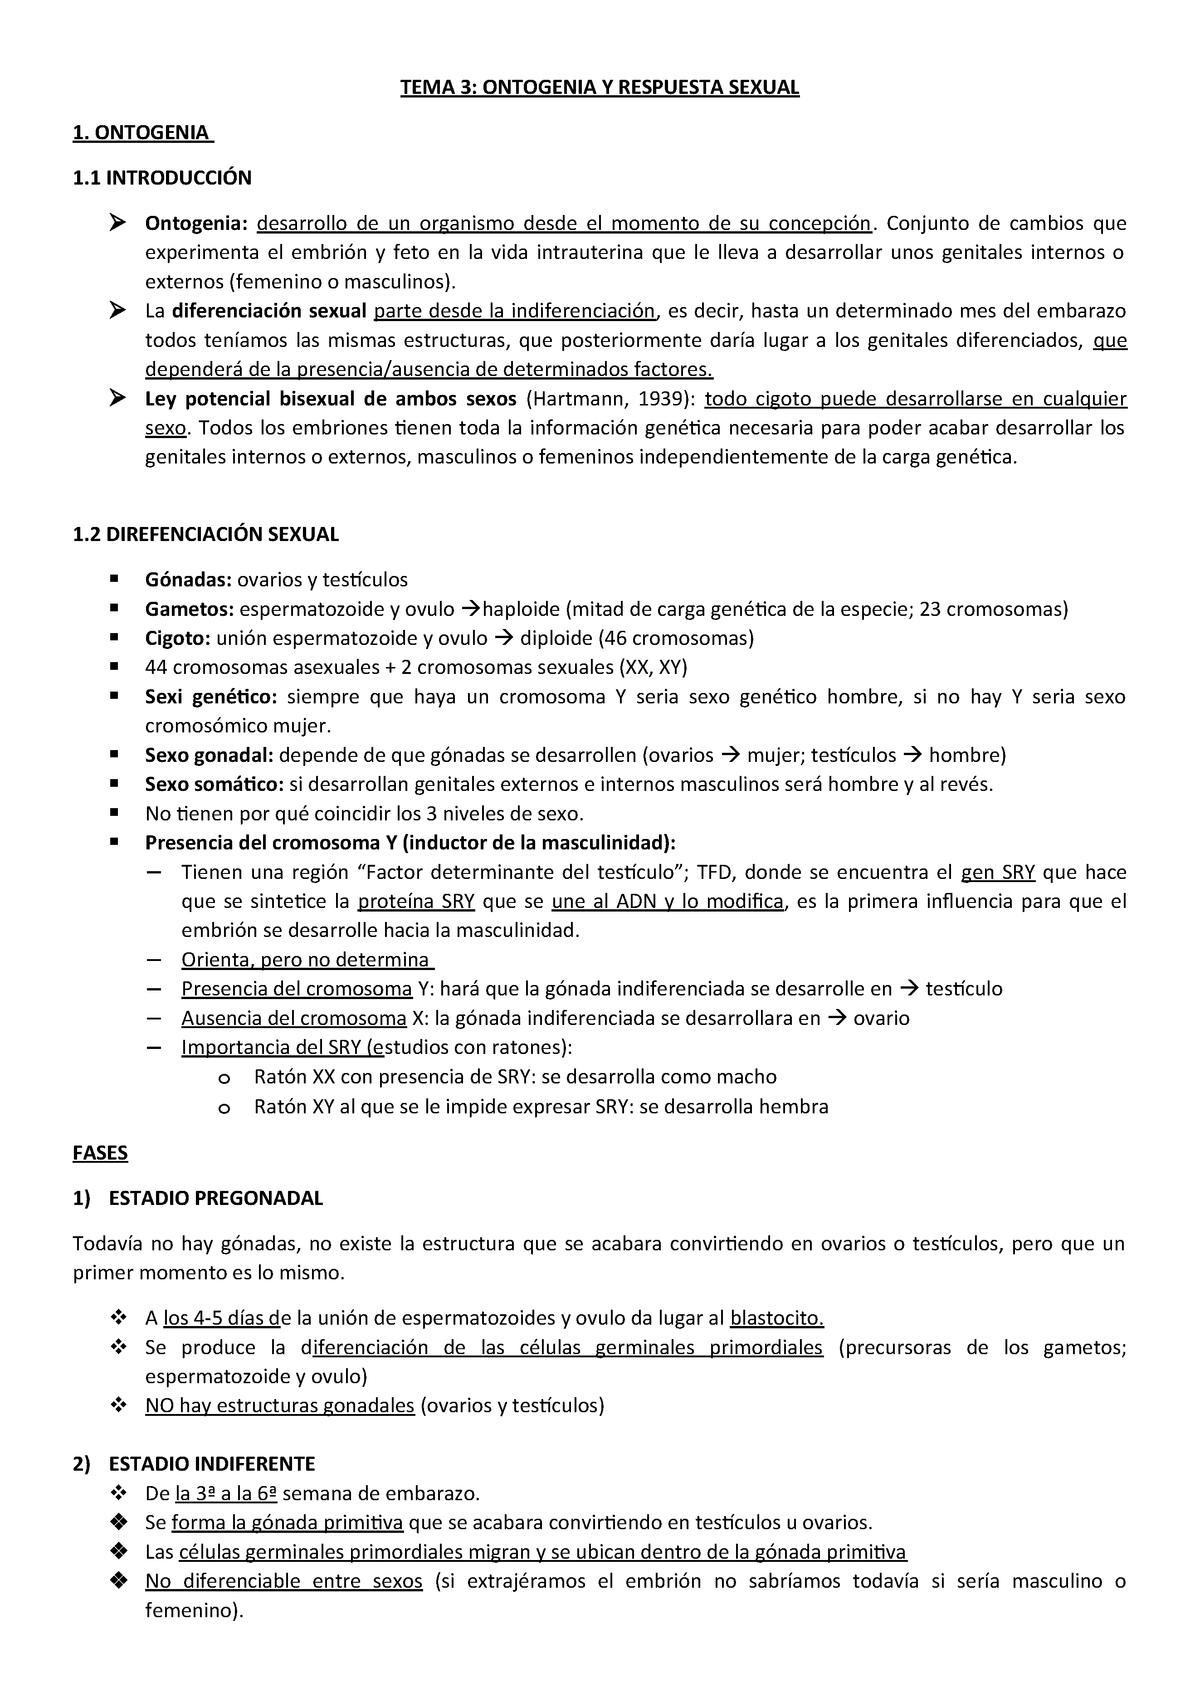 Tema 3 Apuntes Tema 3 Psicologia De La Sexualitat 364104